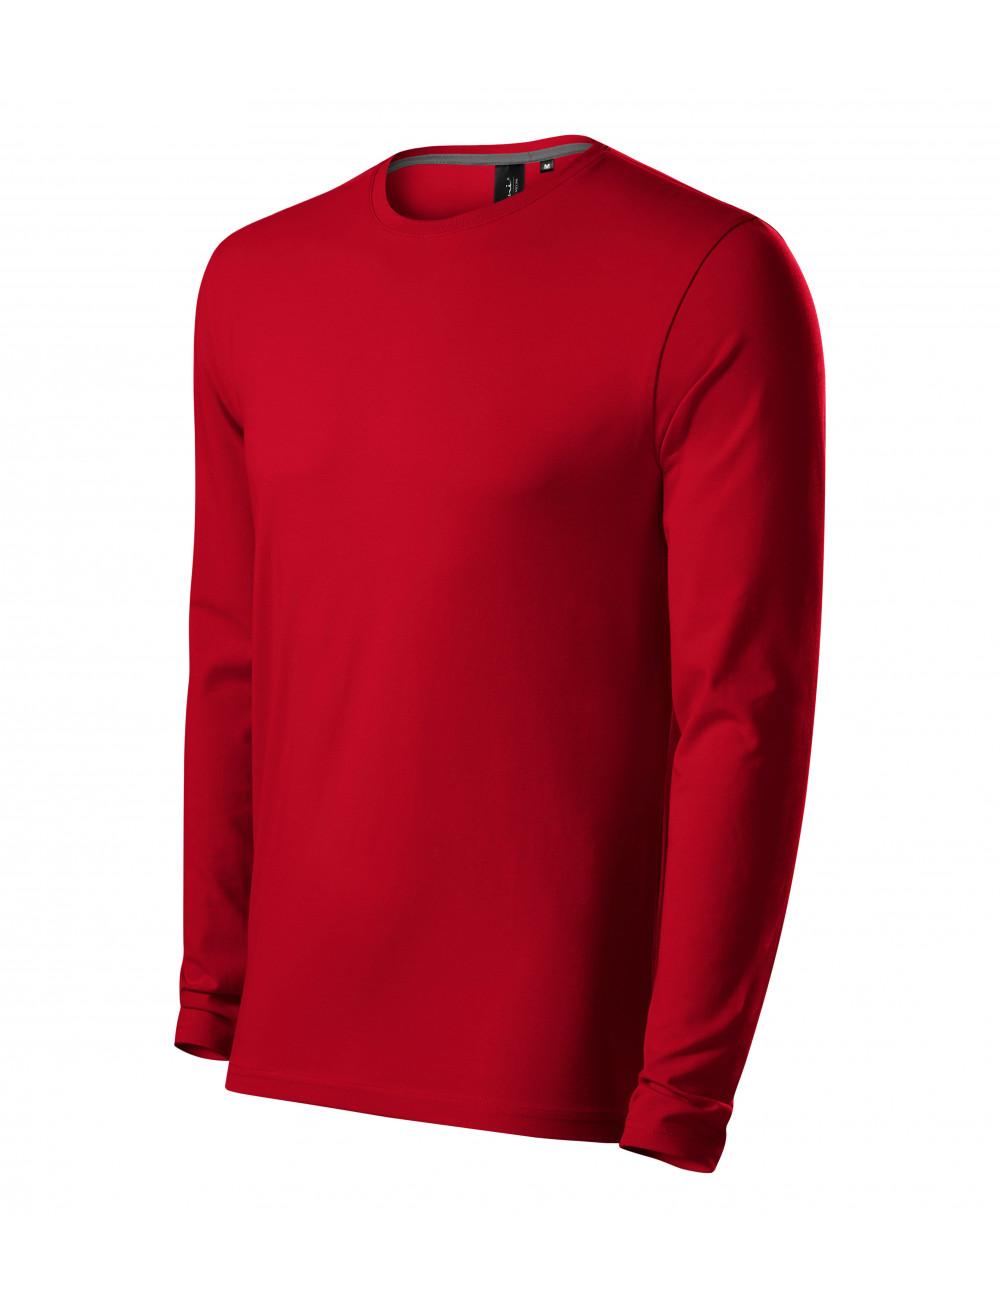 Adler MALFINIPREMIUM Koszulka męska Brave 155 formula red